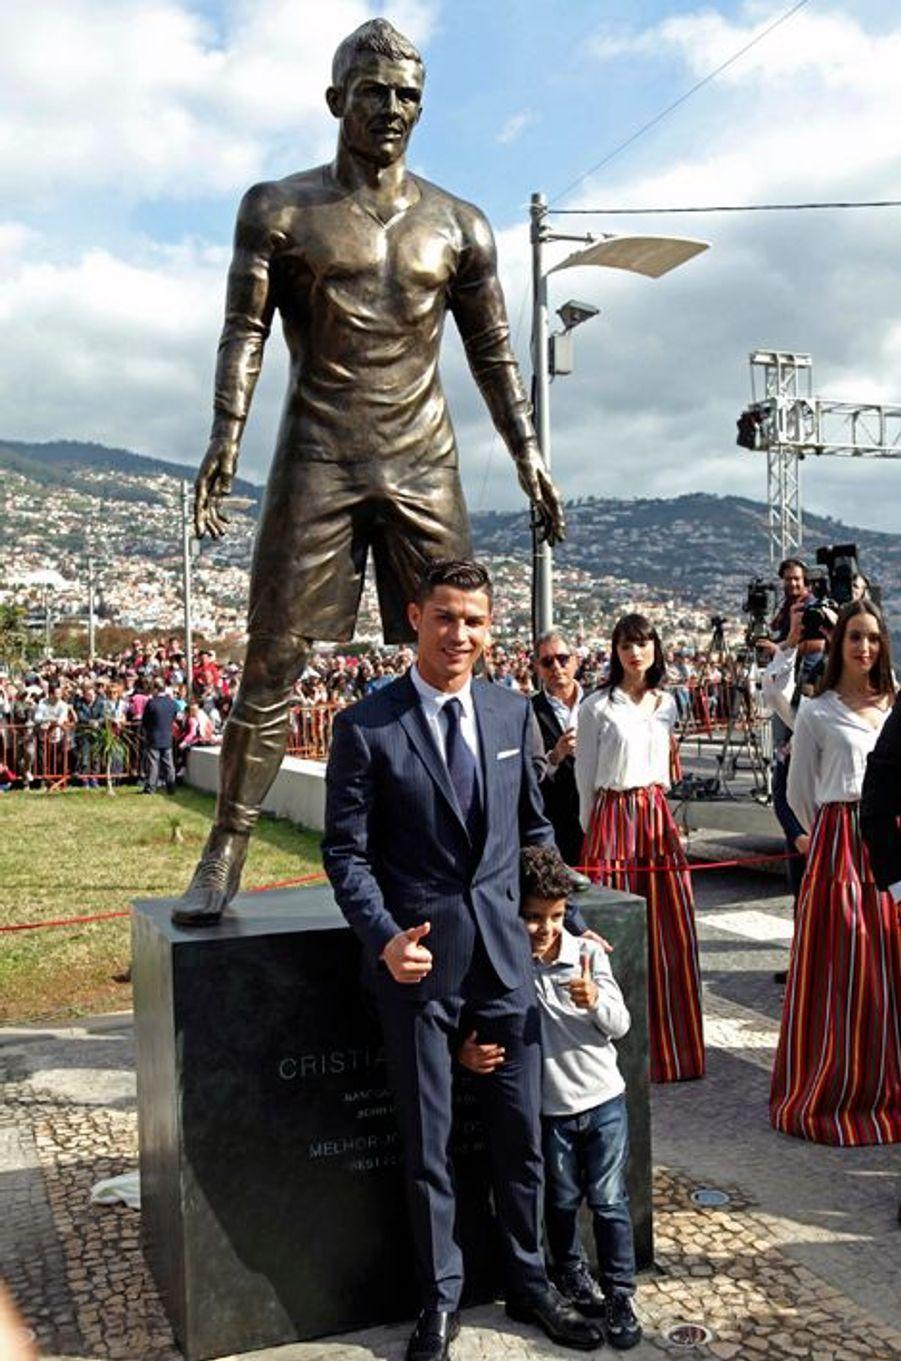 Cristiano Ronaldo avec son fils Cristiano Jr devant sa statue à Funchal, le 21 décembre 2014